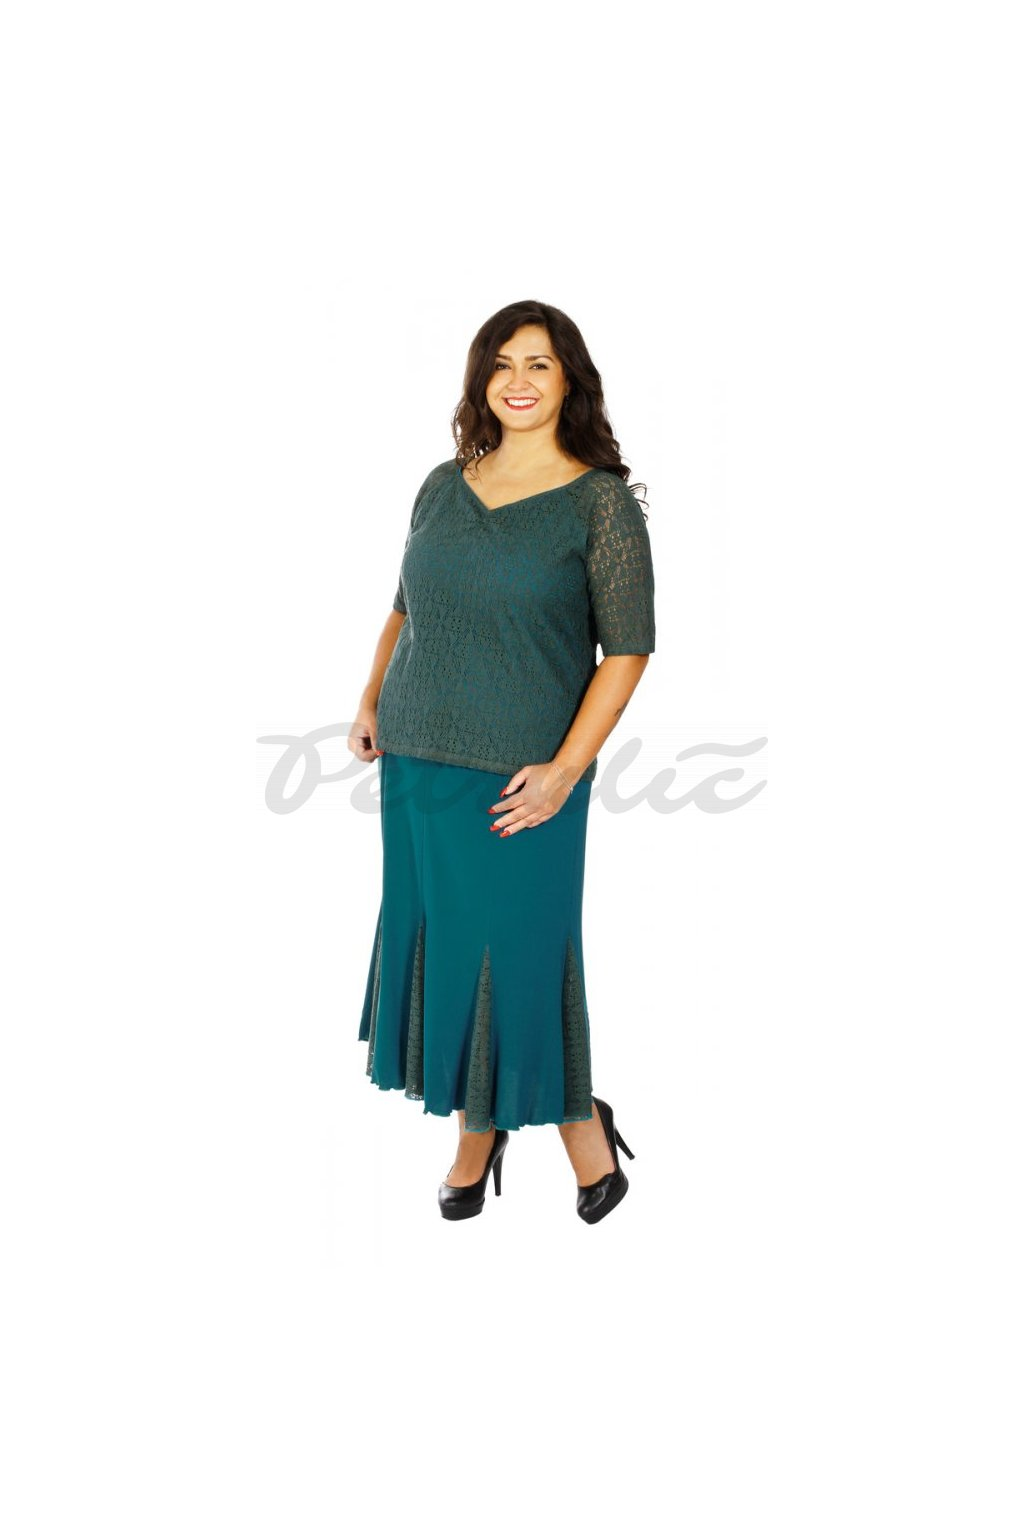 ZDENA - sukně s krajkou 80 - 85 cm